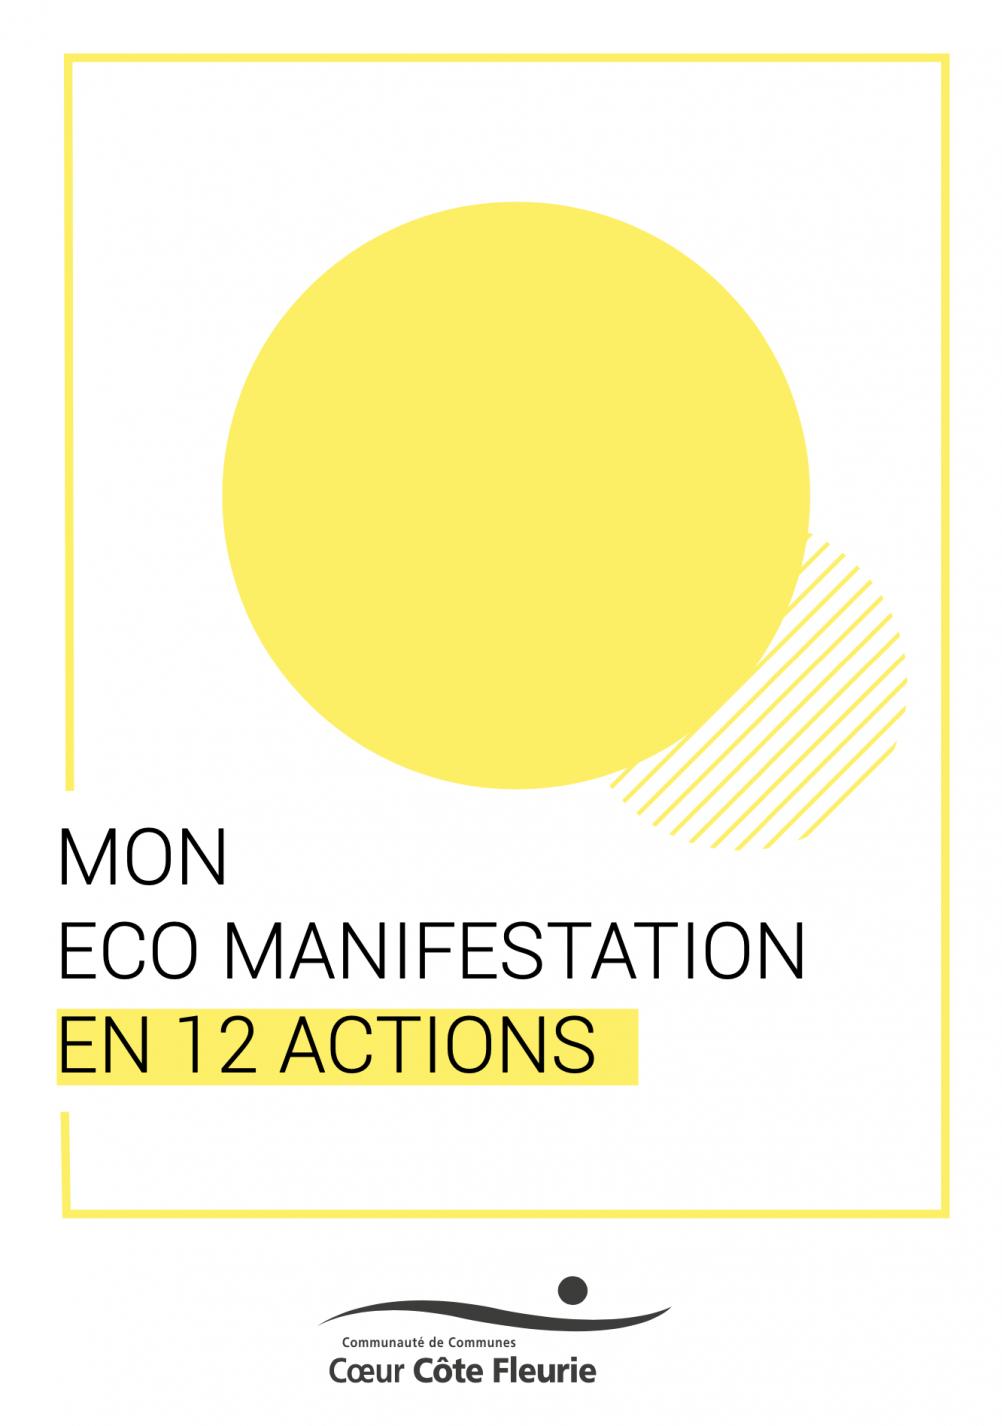 4cf-couv-guide-eco-manifestation-e1596632400101.png